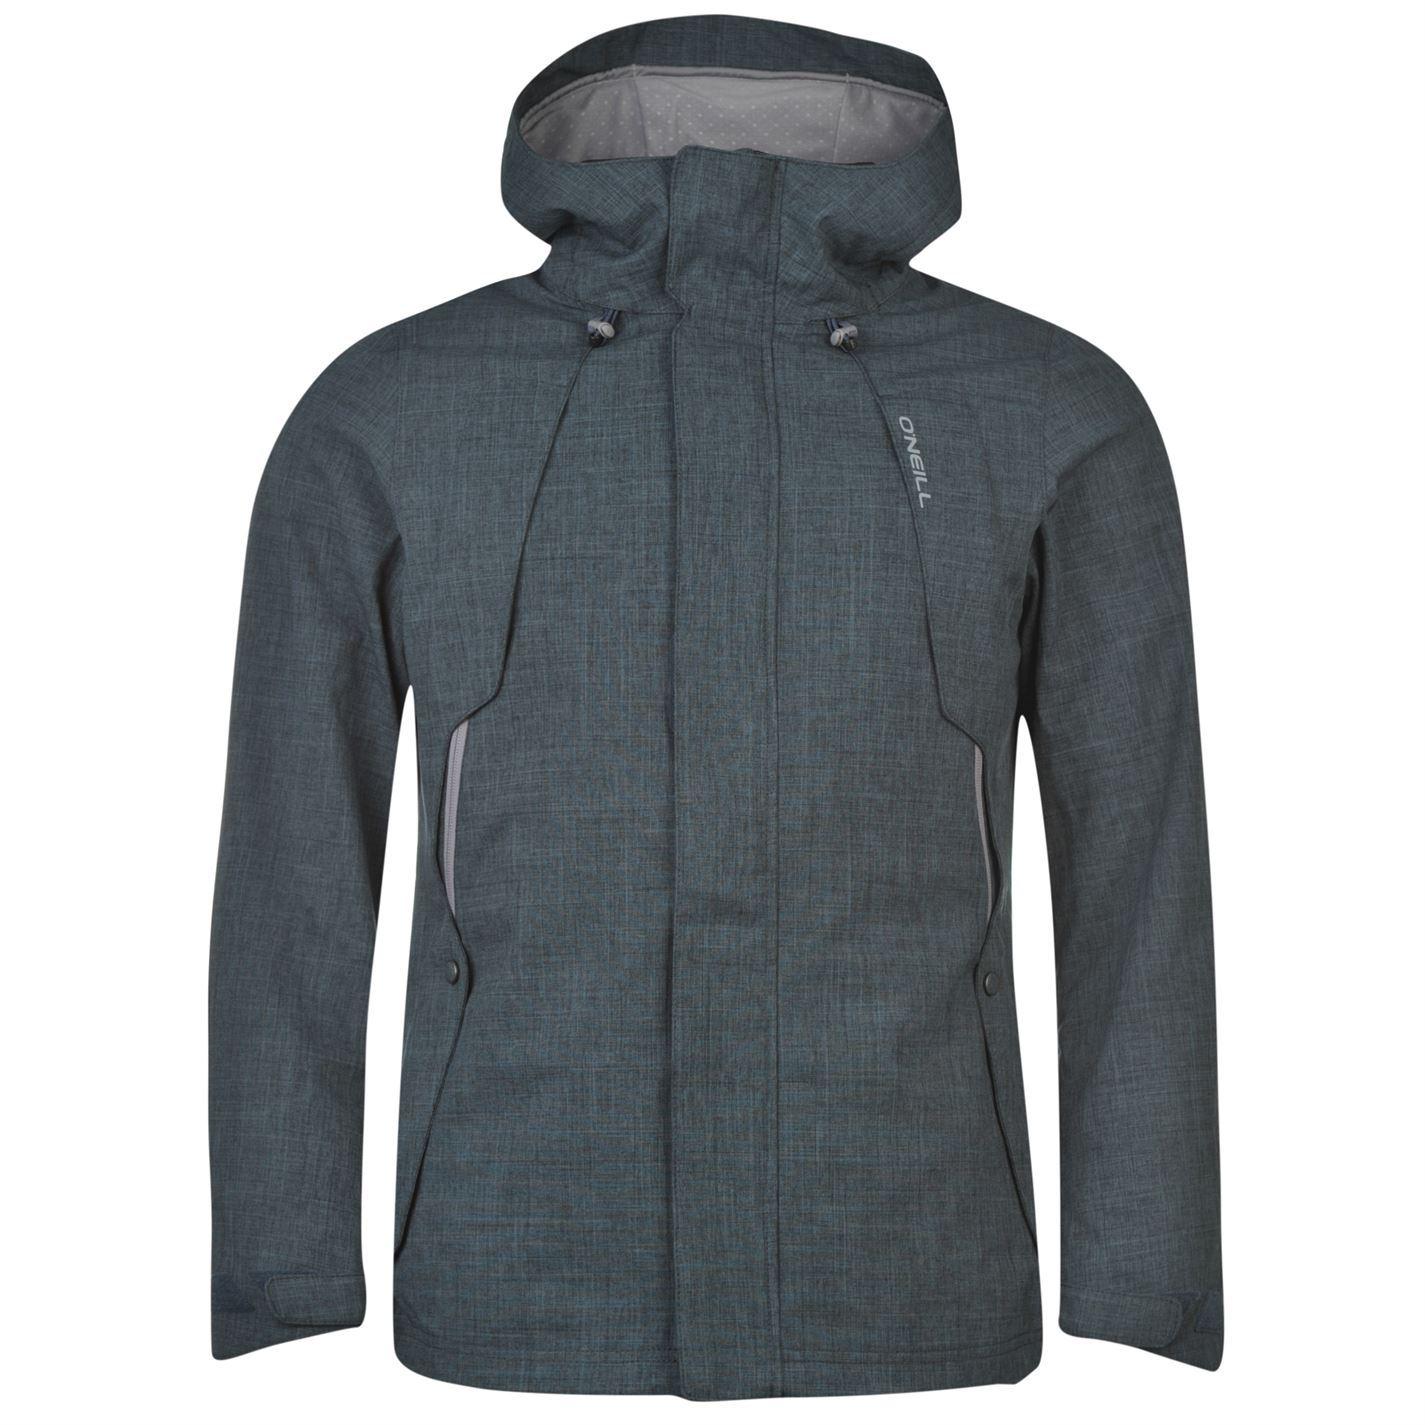 29a42d8cdc542 ONeill Womens Rainbow Ski Jacket Coat Top Long Sleeve Waterproof ...